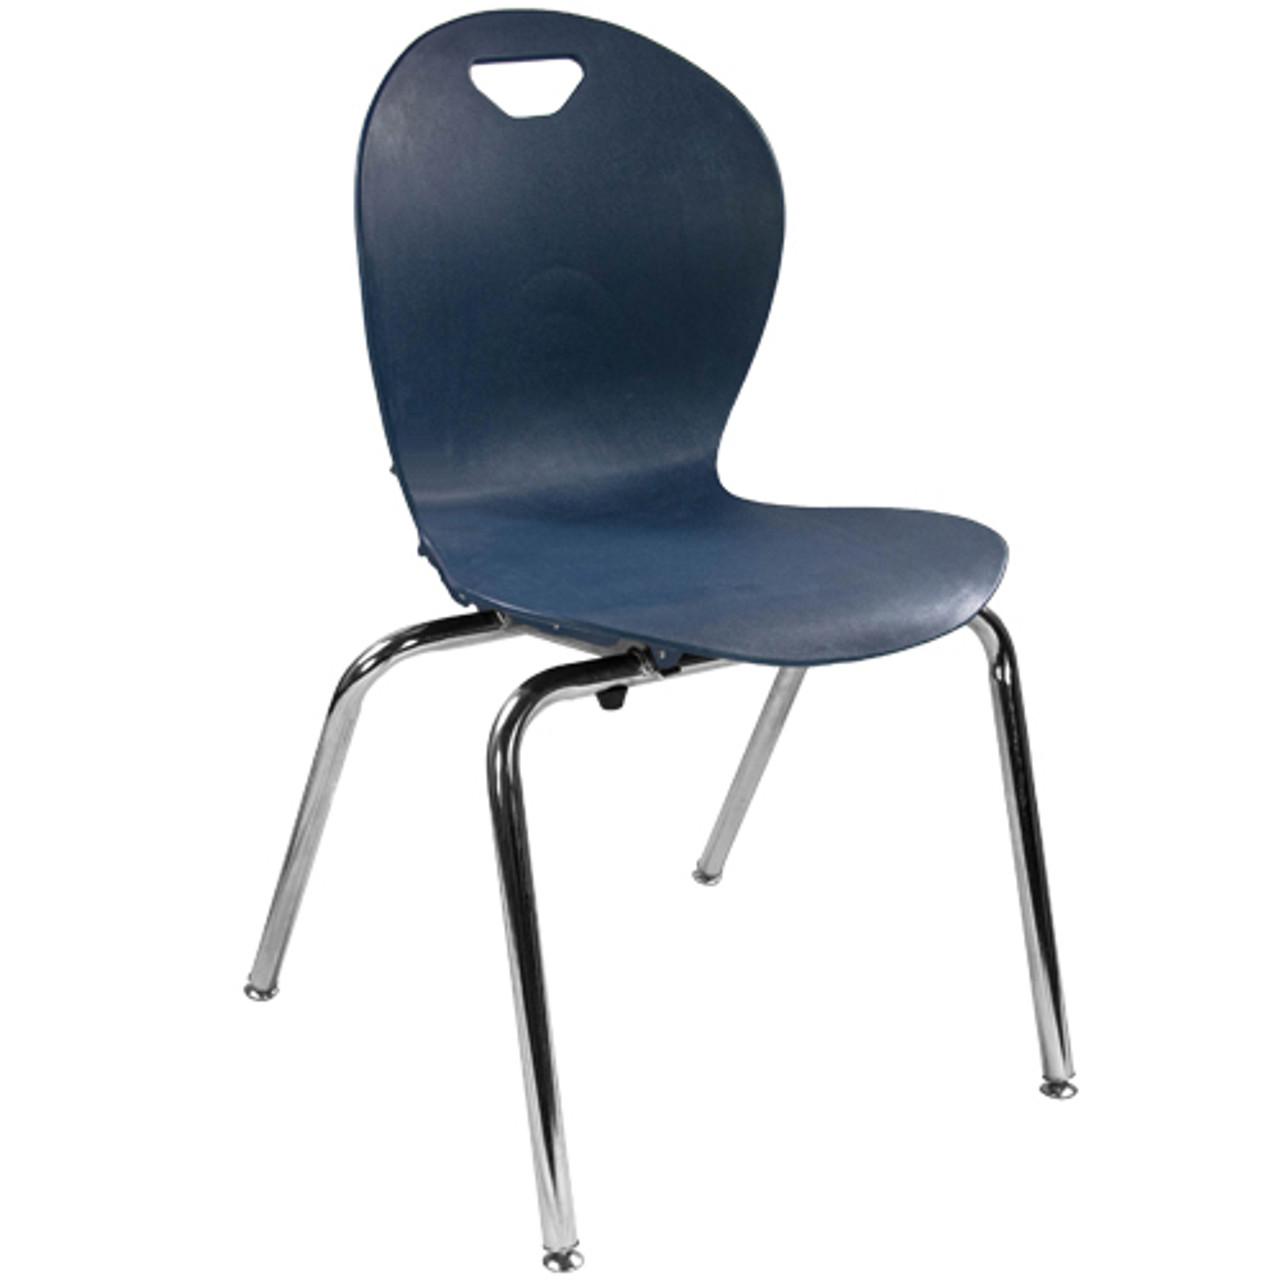 Advantage 18-in Navy Student Stack School Chair [ADV-TITAN